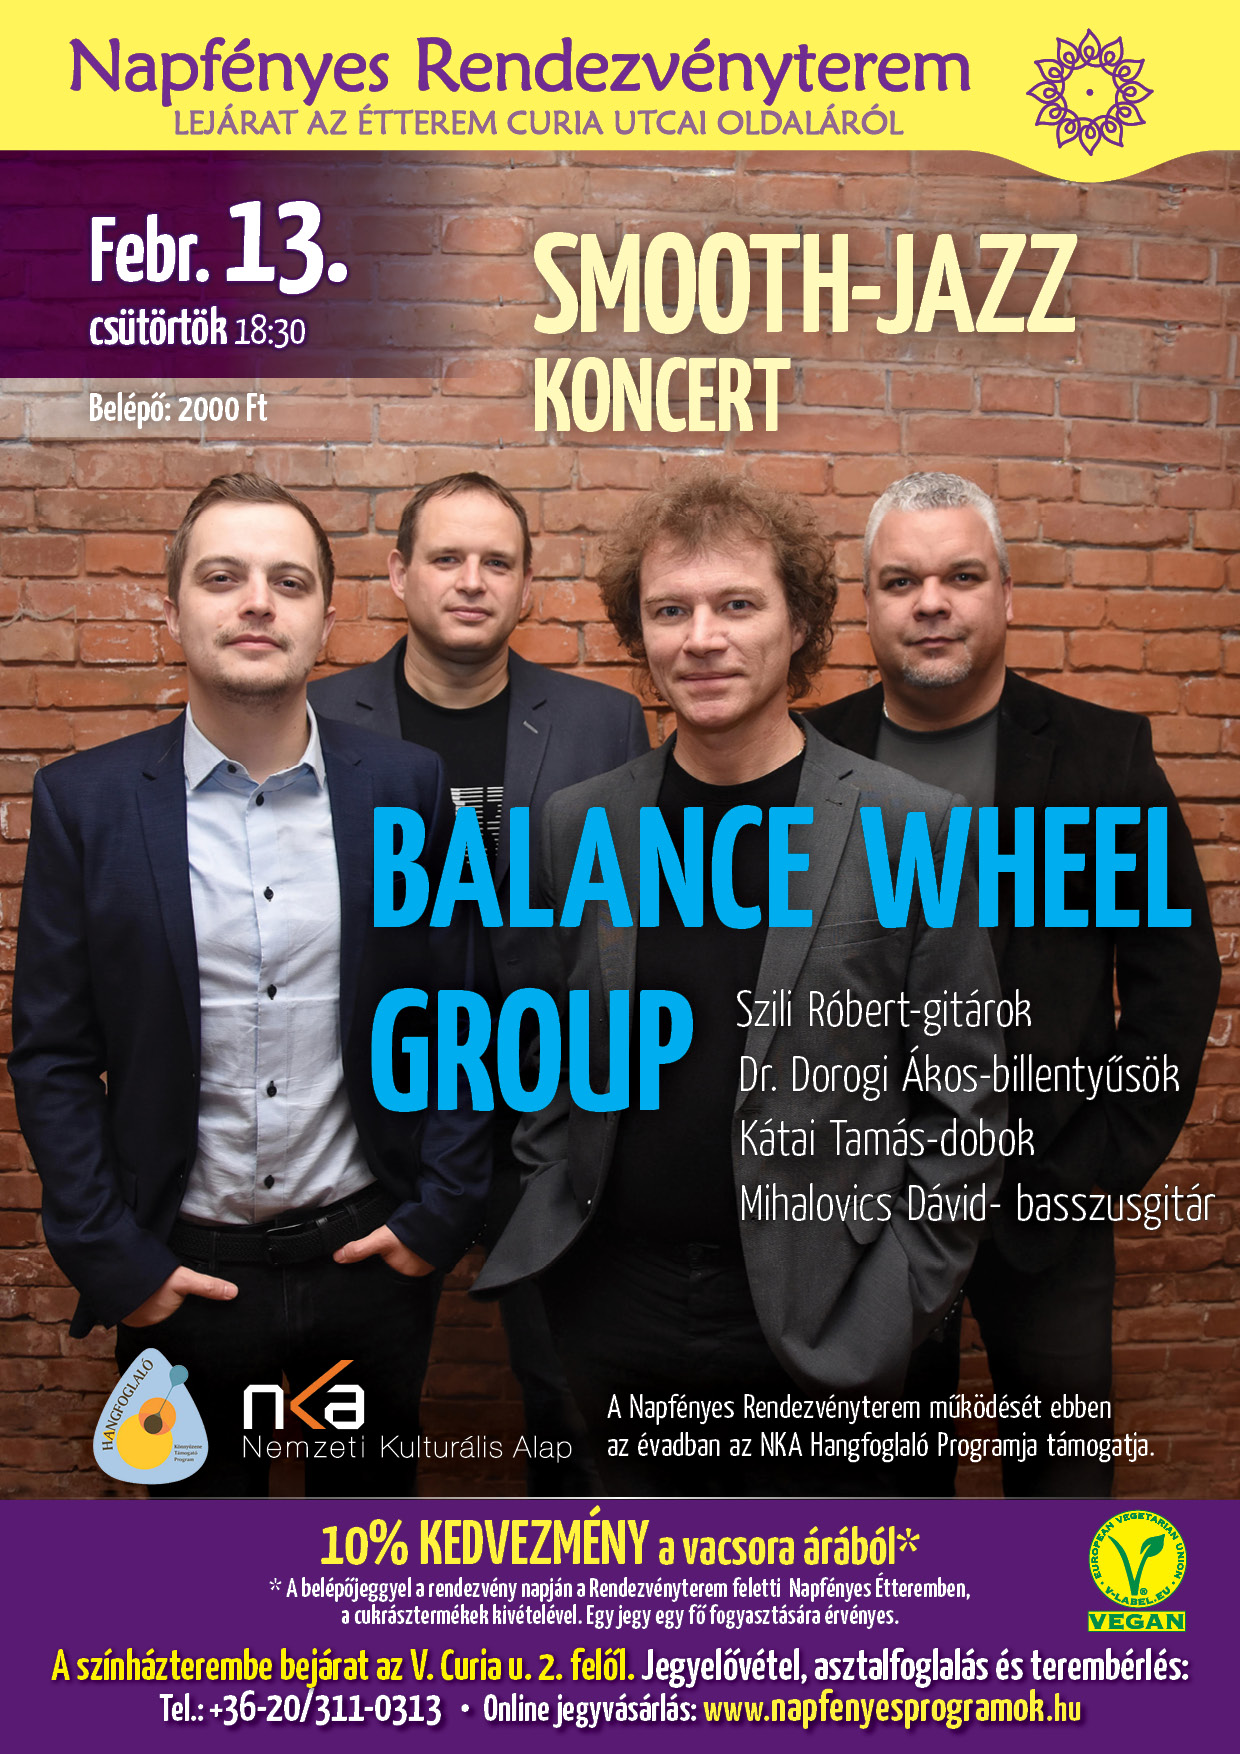 Balance Wheel Group A4